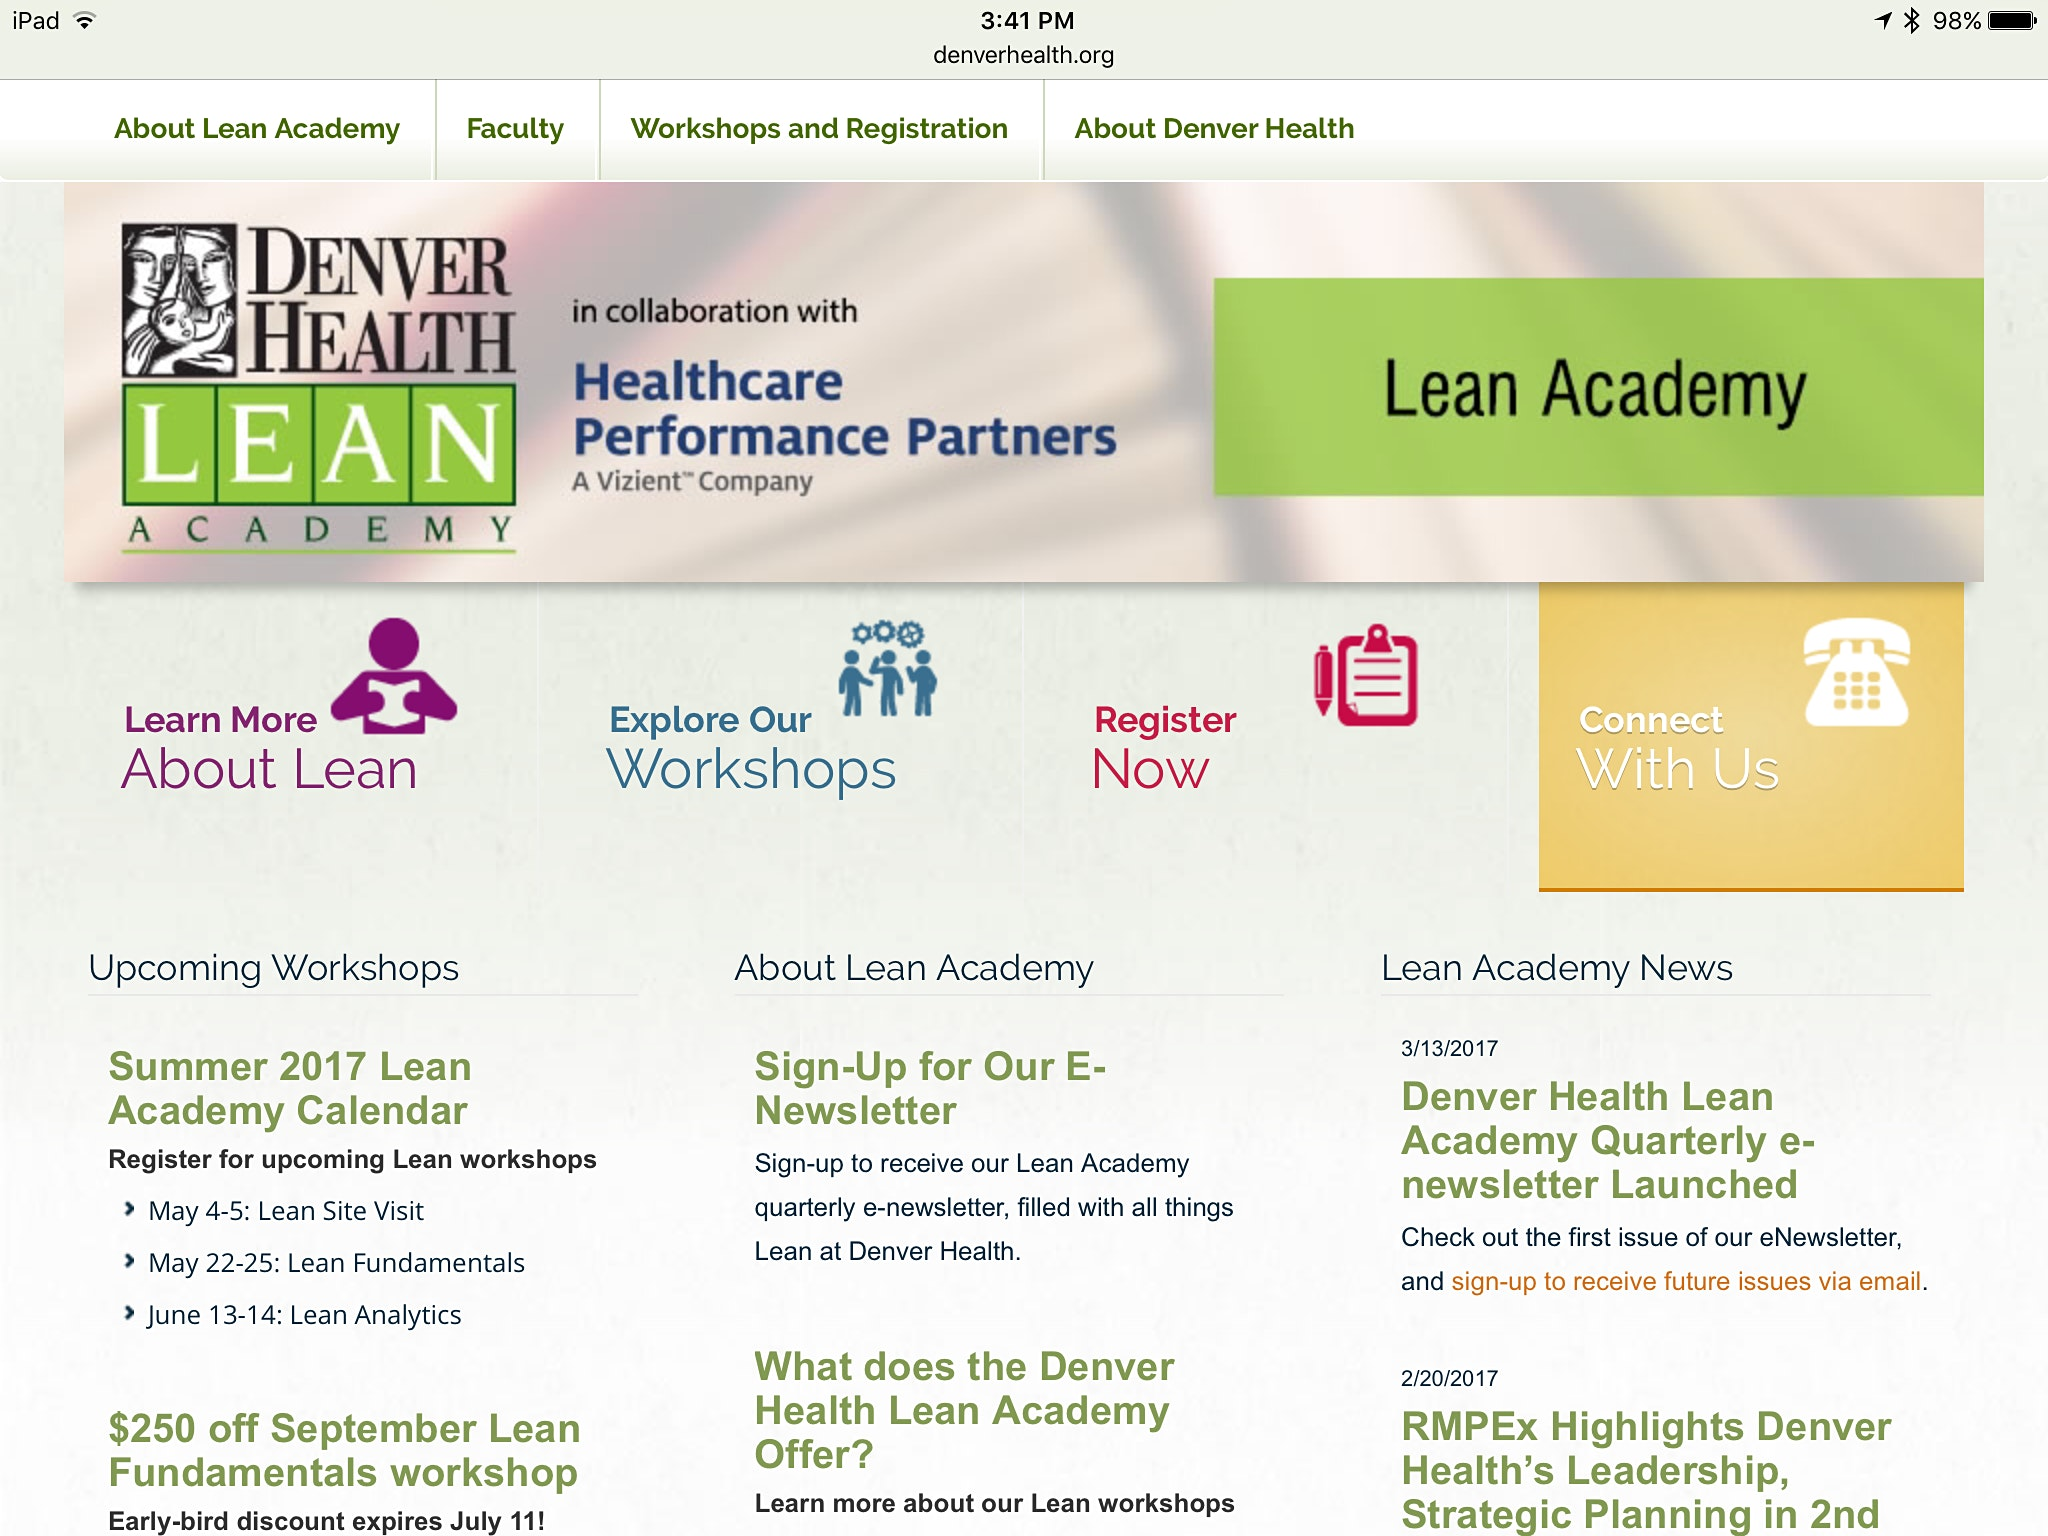 CLN Quarterly Kaizen at Denver Health